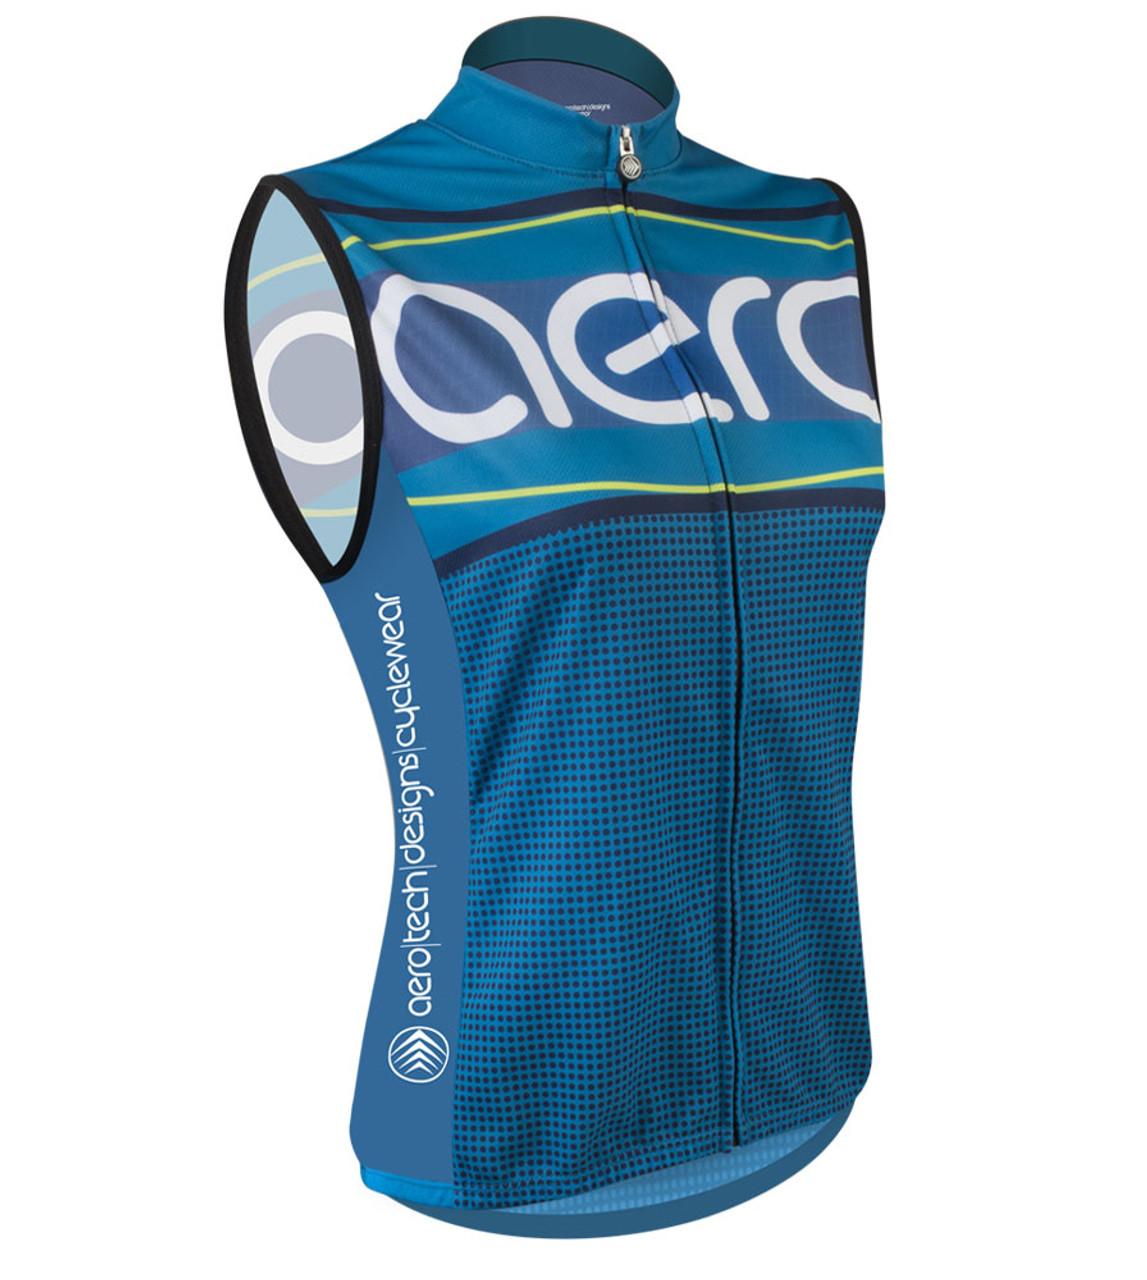 Aero Tech Designs Mens Better Together Cycling Bike Jersey Biking Top USA Made